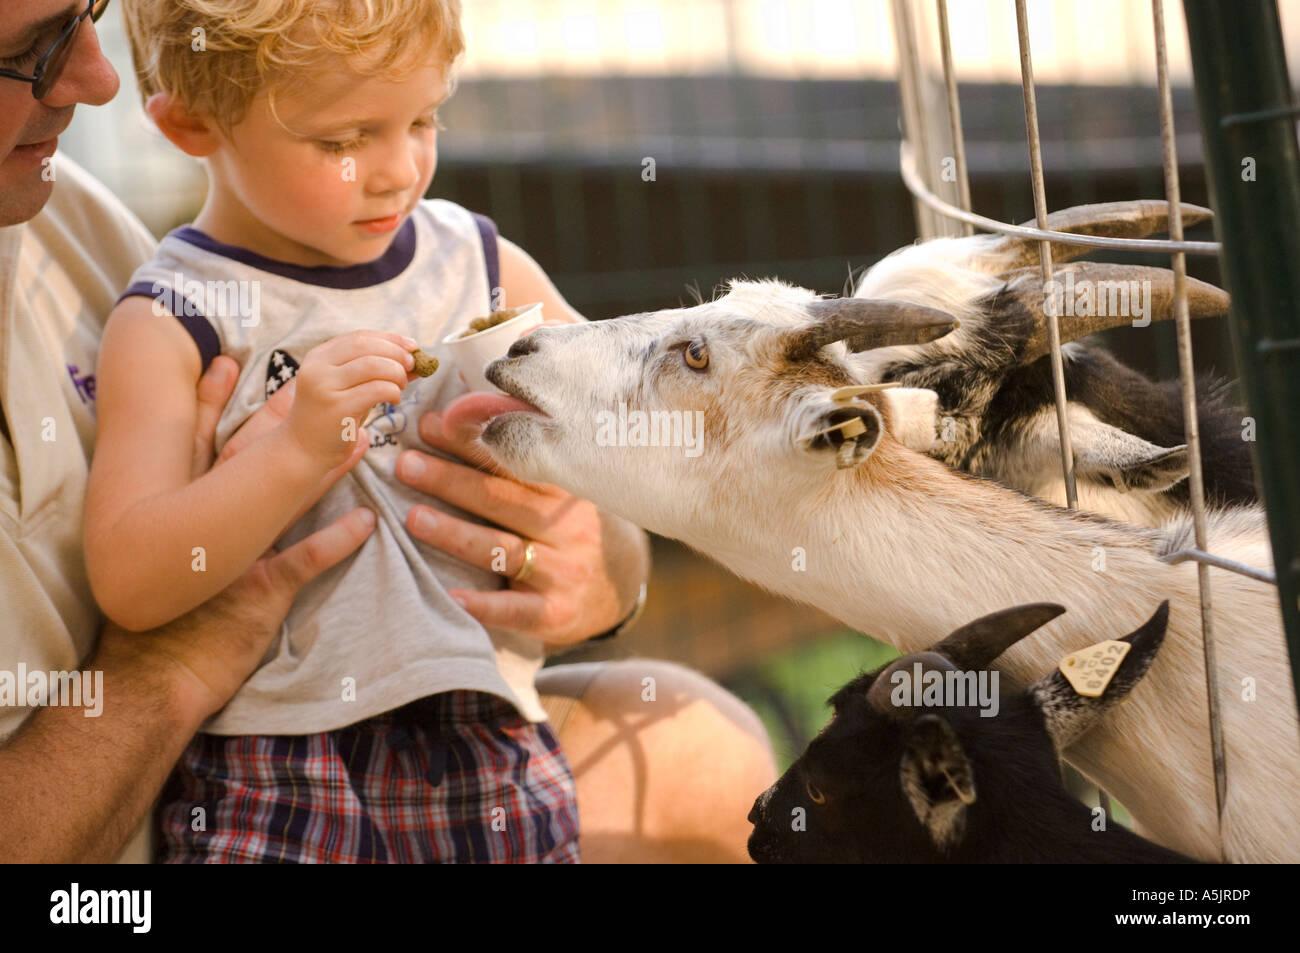 Kid feeding a goat at the Illinois State Fair in Springfield Illinois - Stock Image